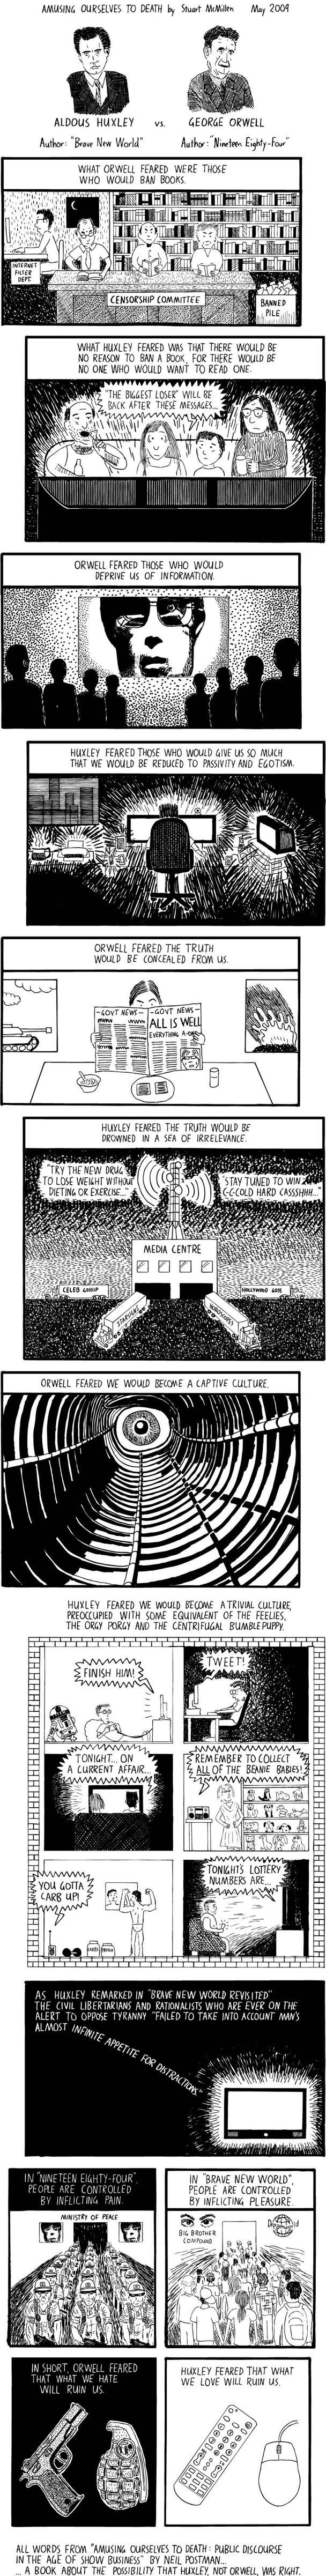 Huxley Versus Orwell Comic